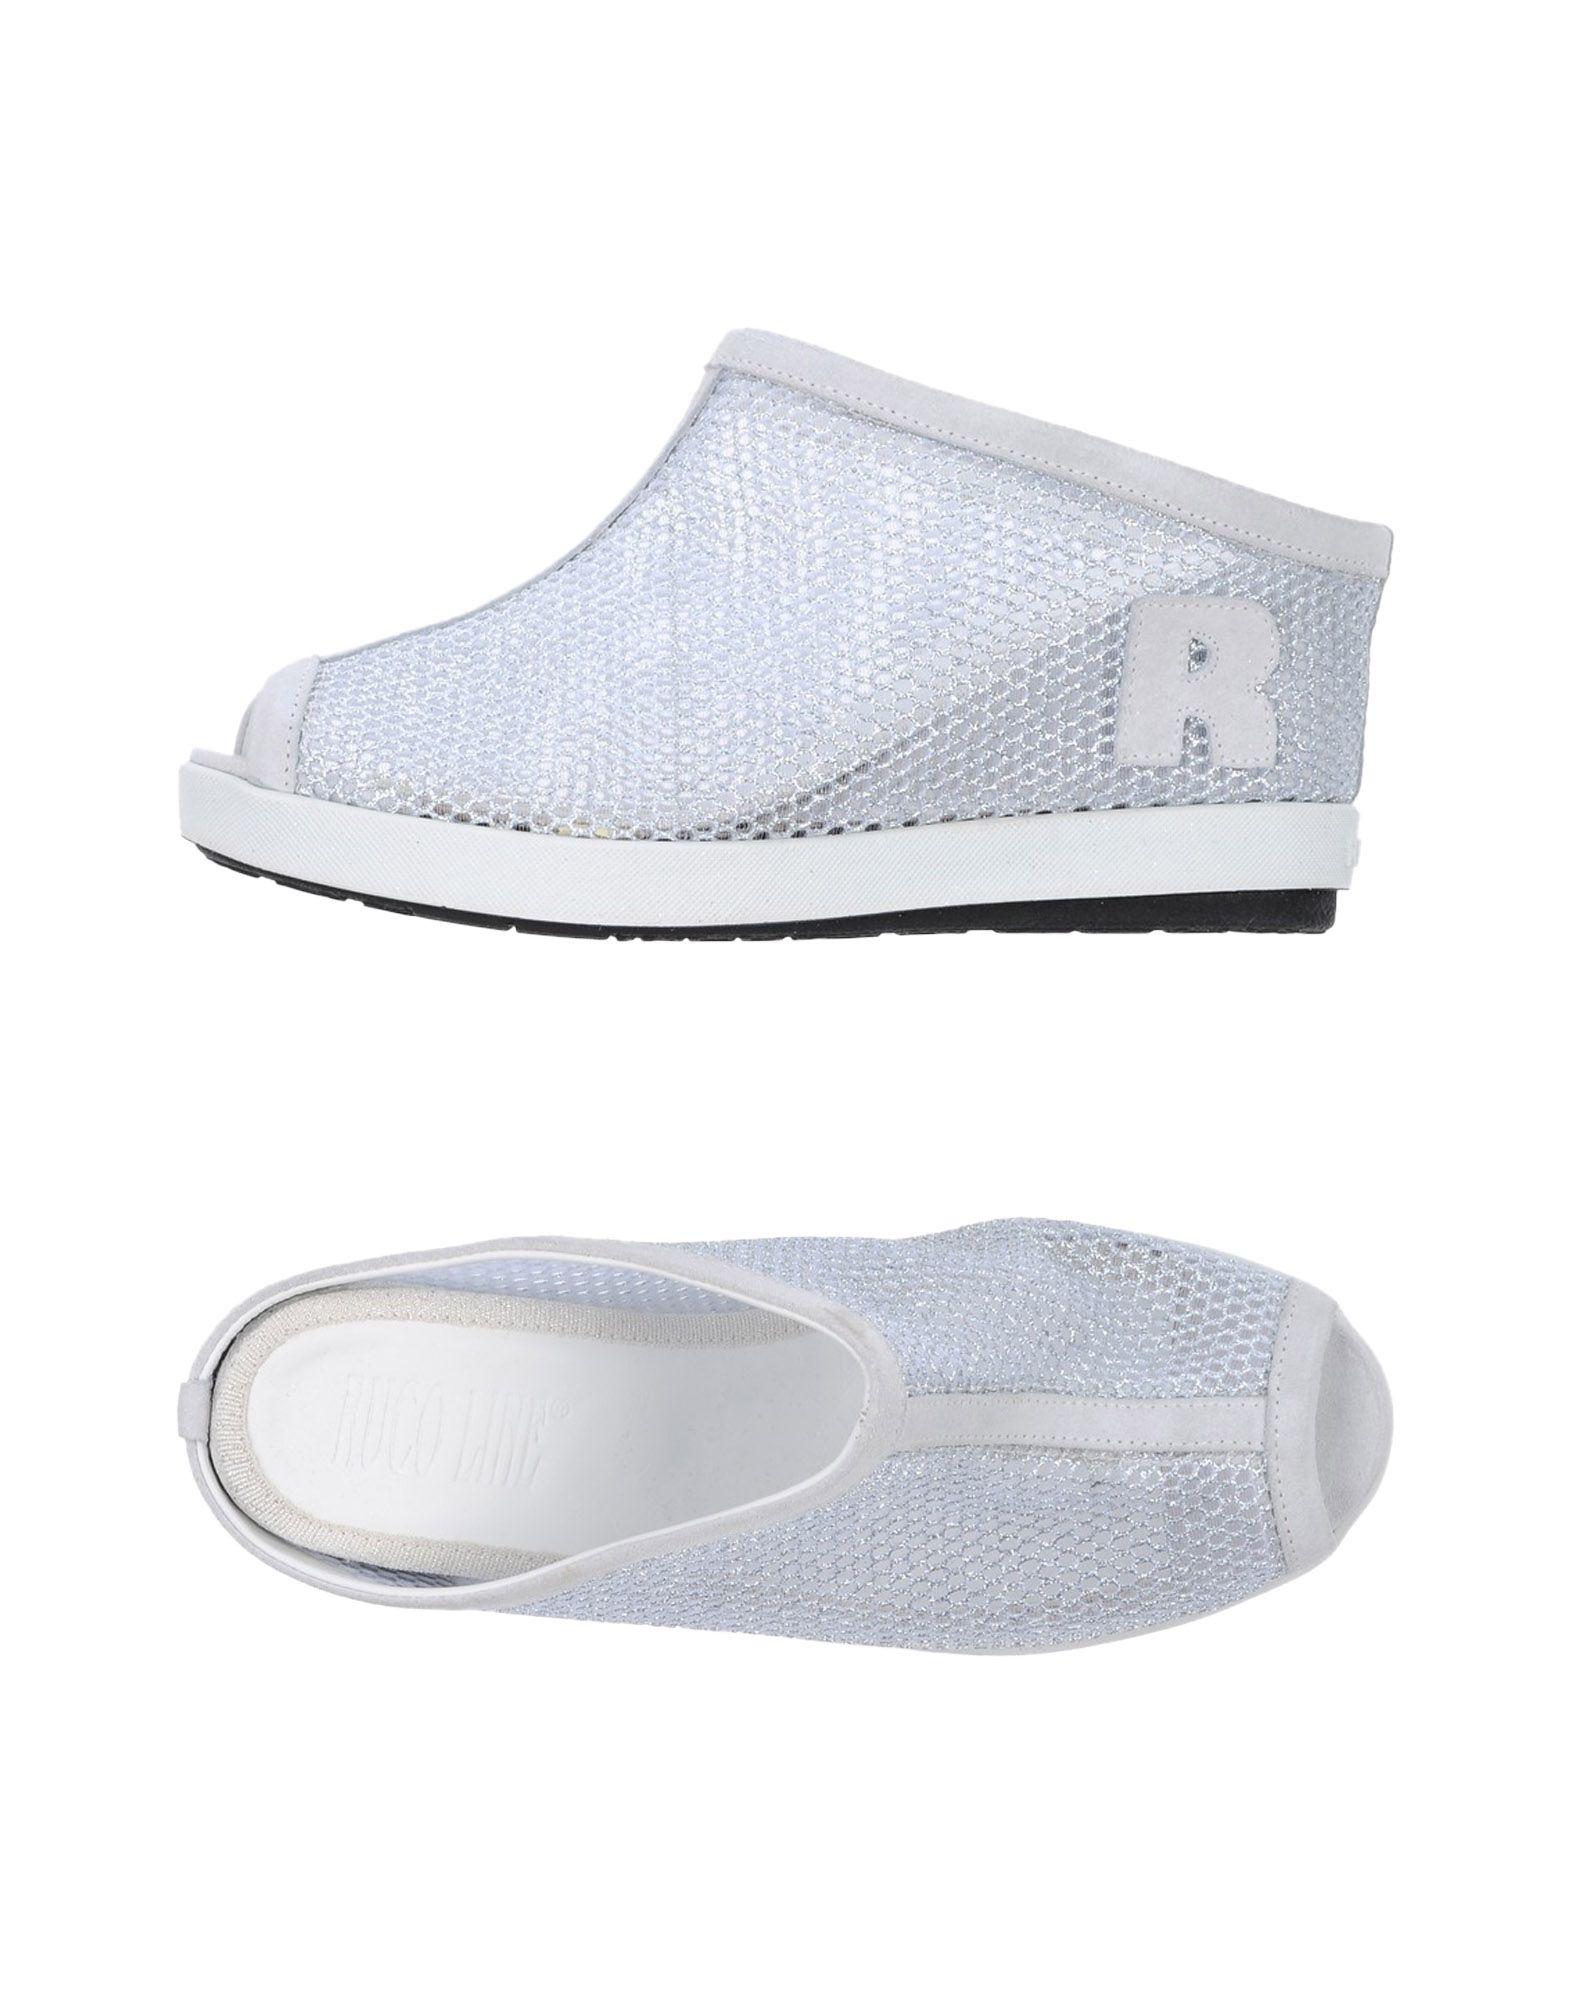 Ruco Schuhe Line Sandalen Damen  11334517RJ Neue Schuhe Ruco 42ebbf